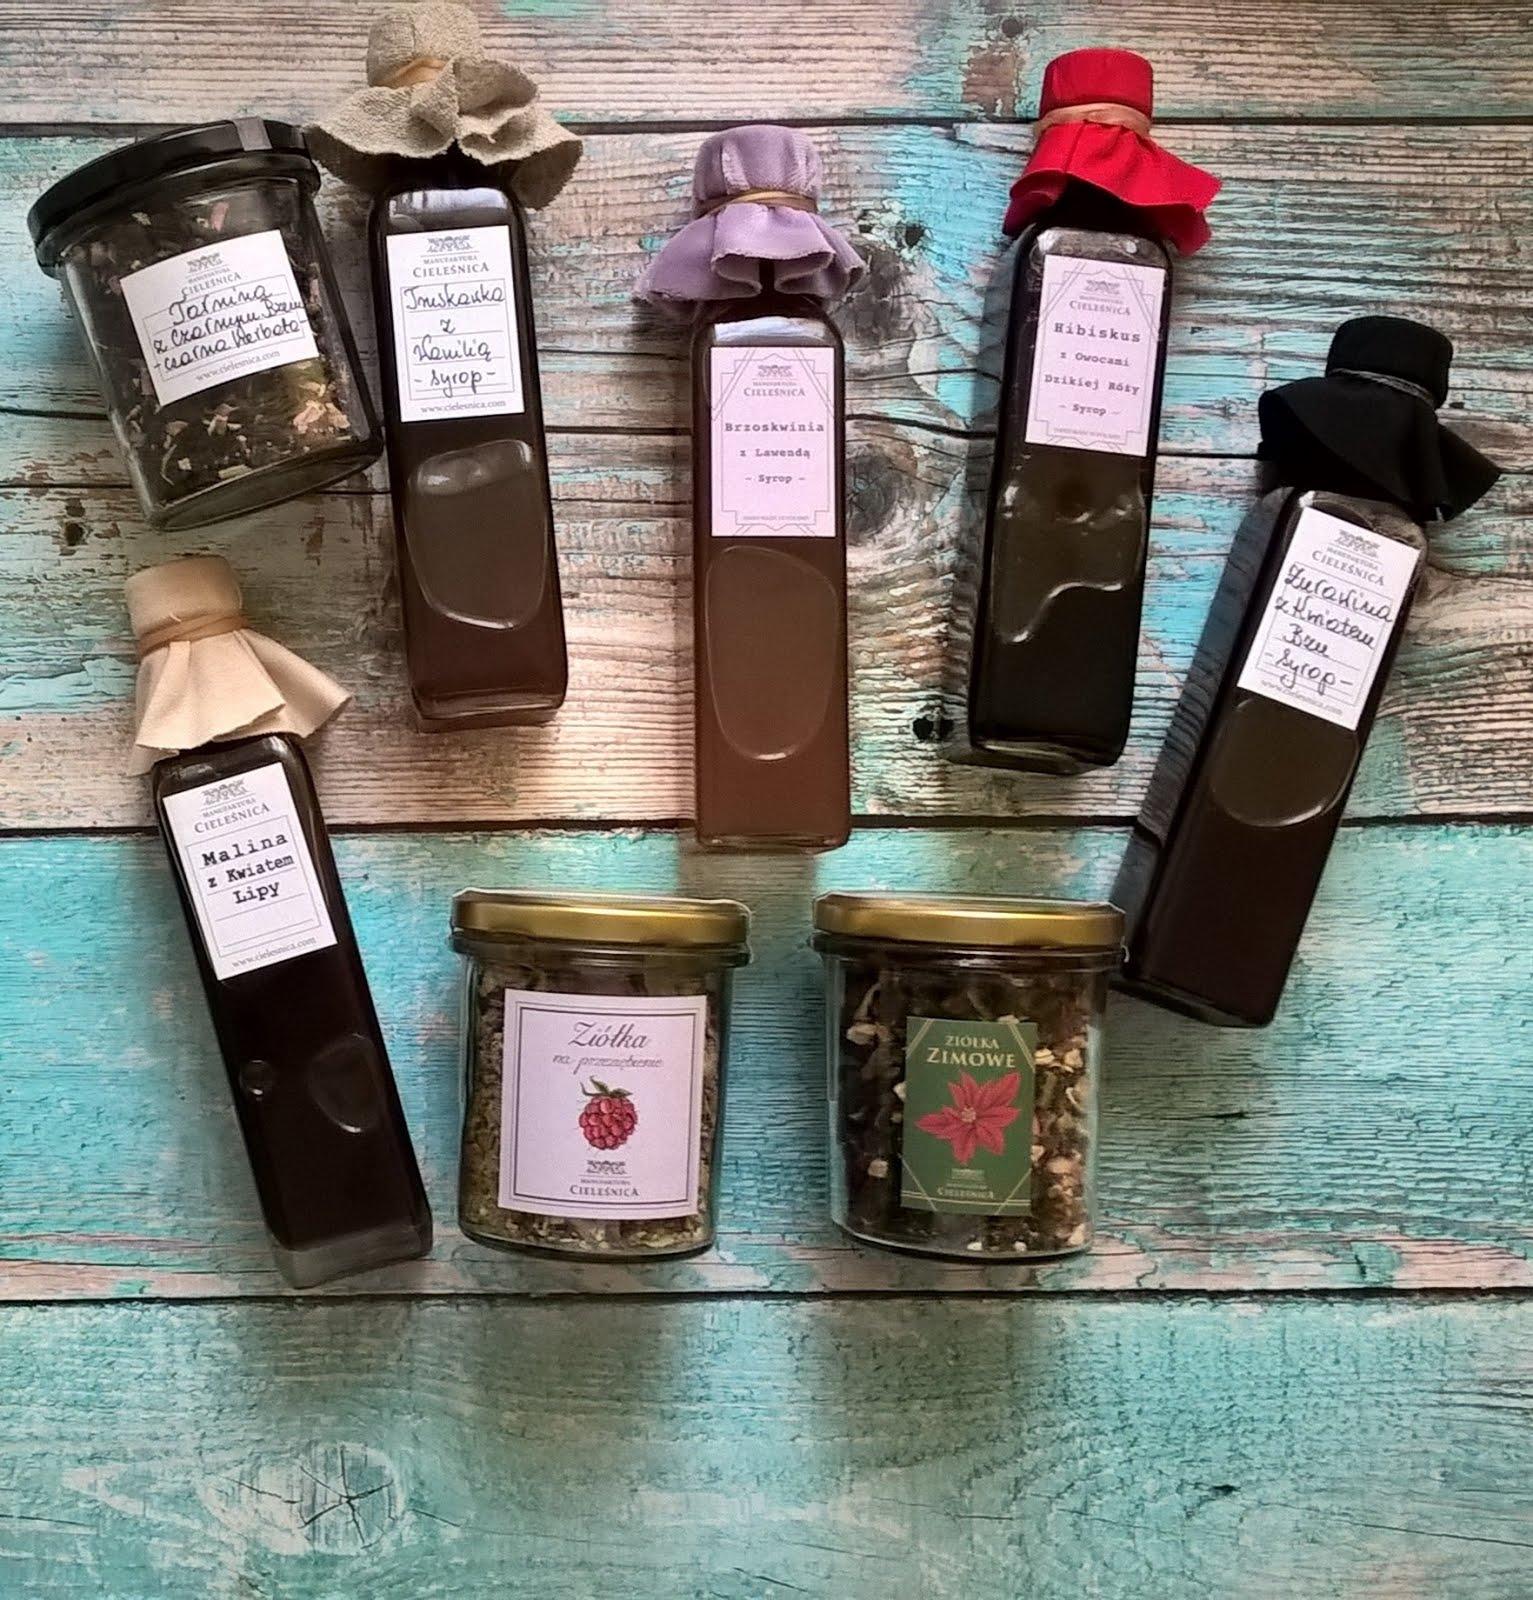 Manufaktura Cieleśnica blog opinie soki, herbaty